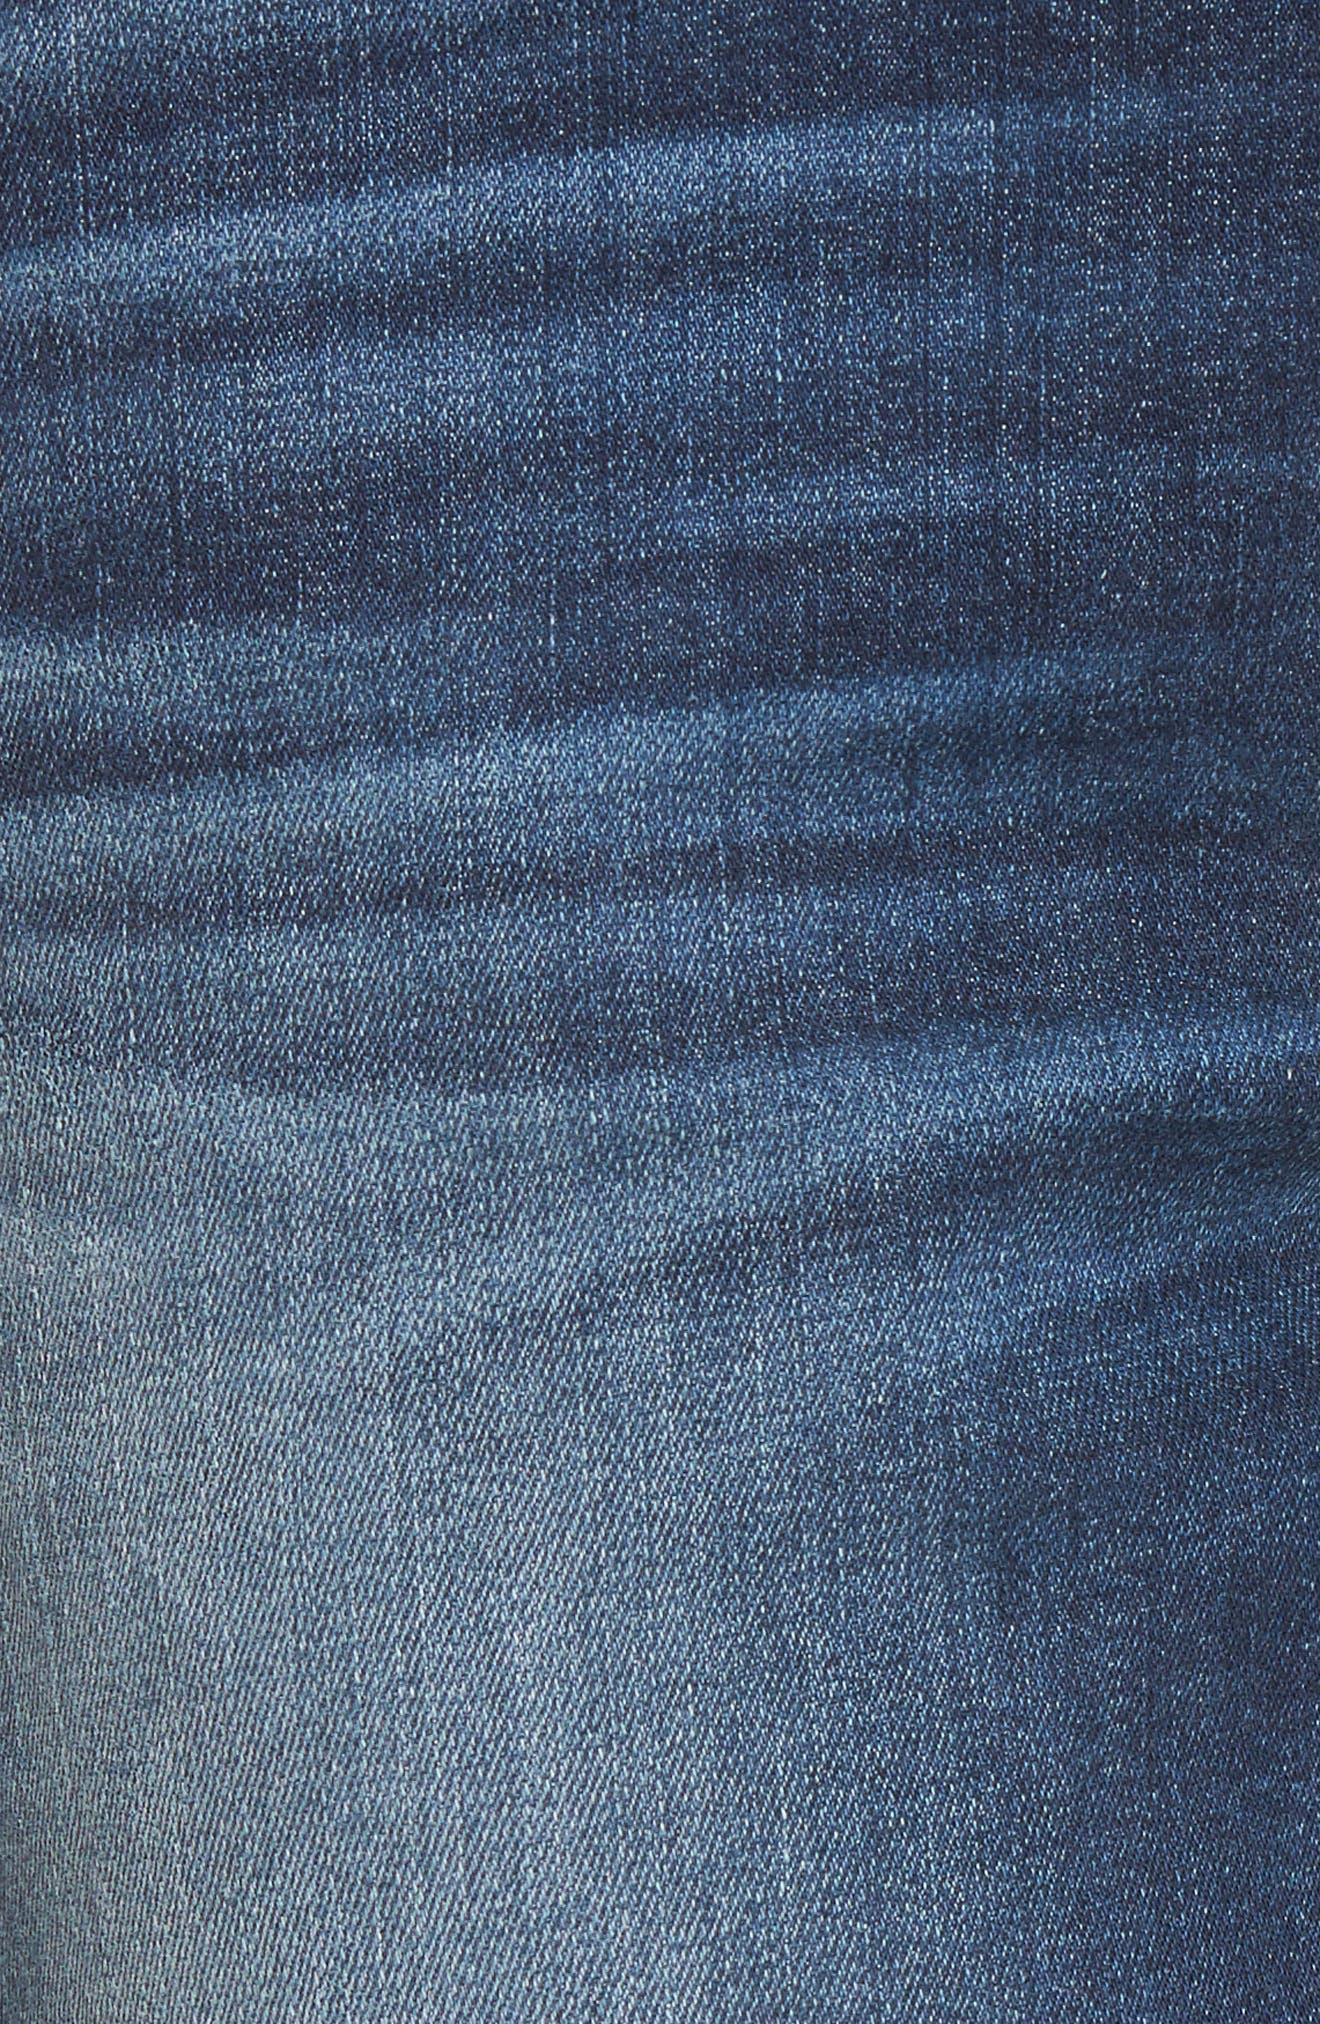 Jimmy Jimmy High Waist Crop Boyfriend Jeans,                             Alternate thumbnail 6, color,                             Blue